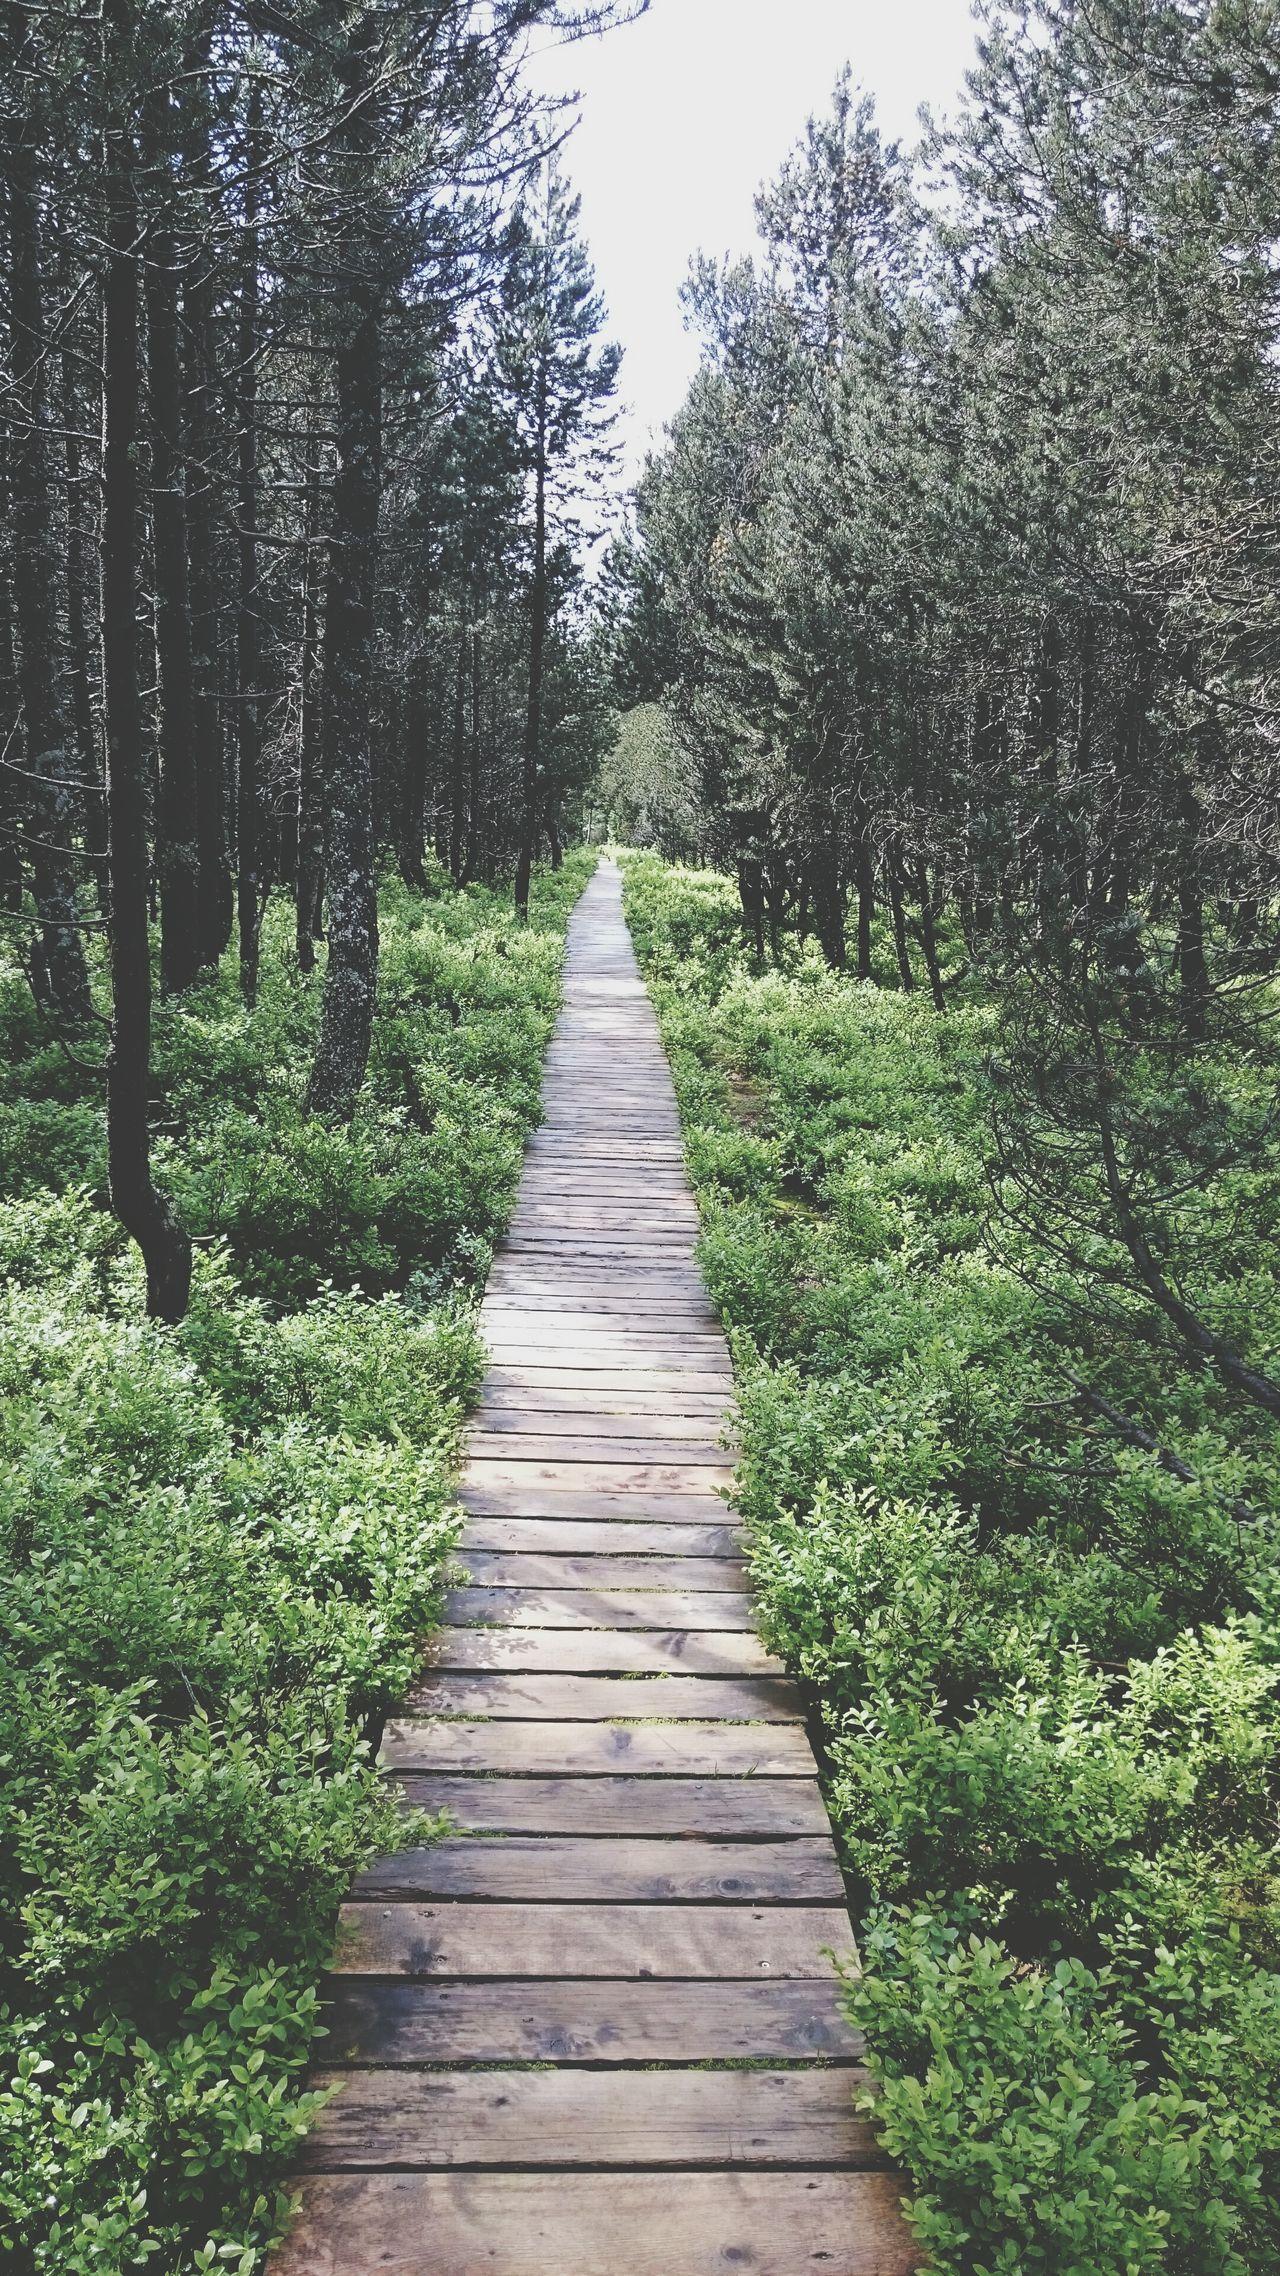 Pathfinder /// Path Way Forward Looking Forward Wood Forest